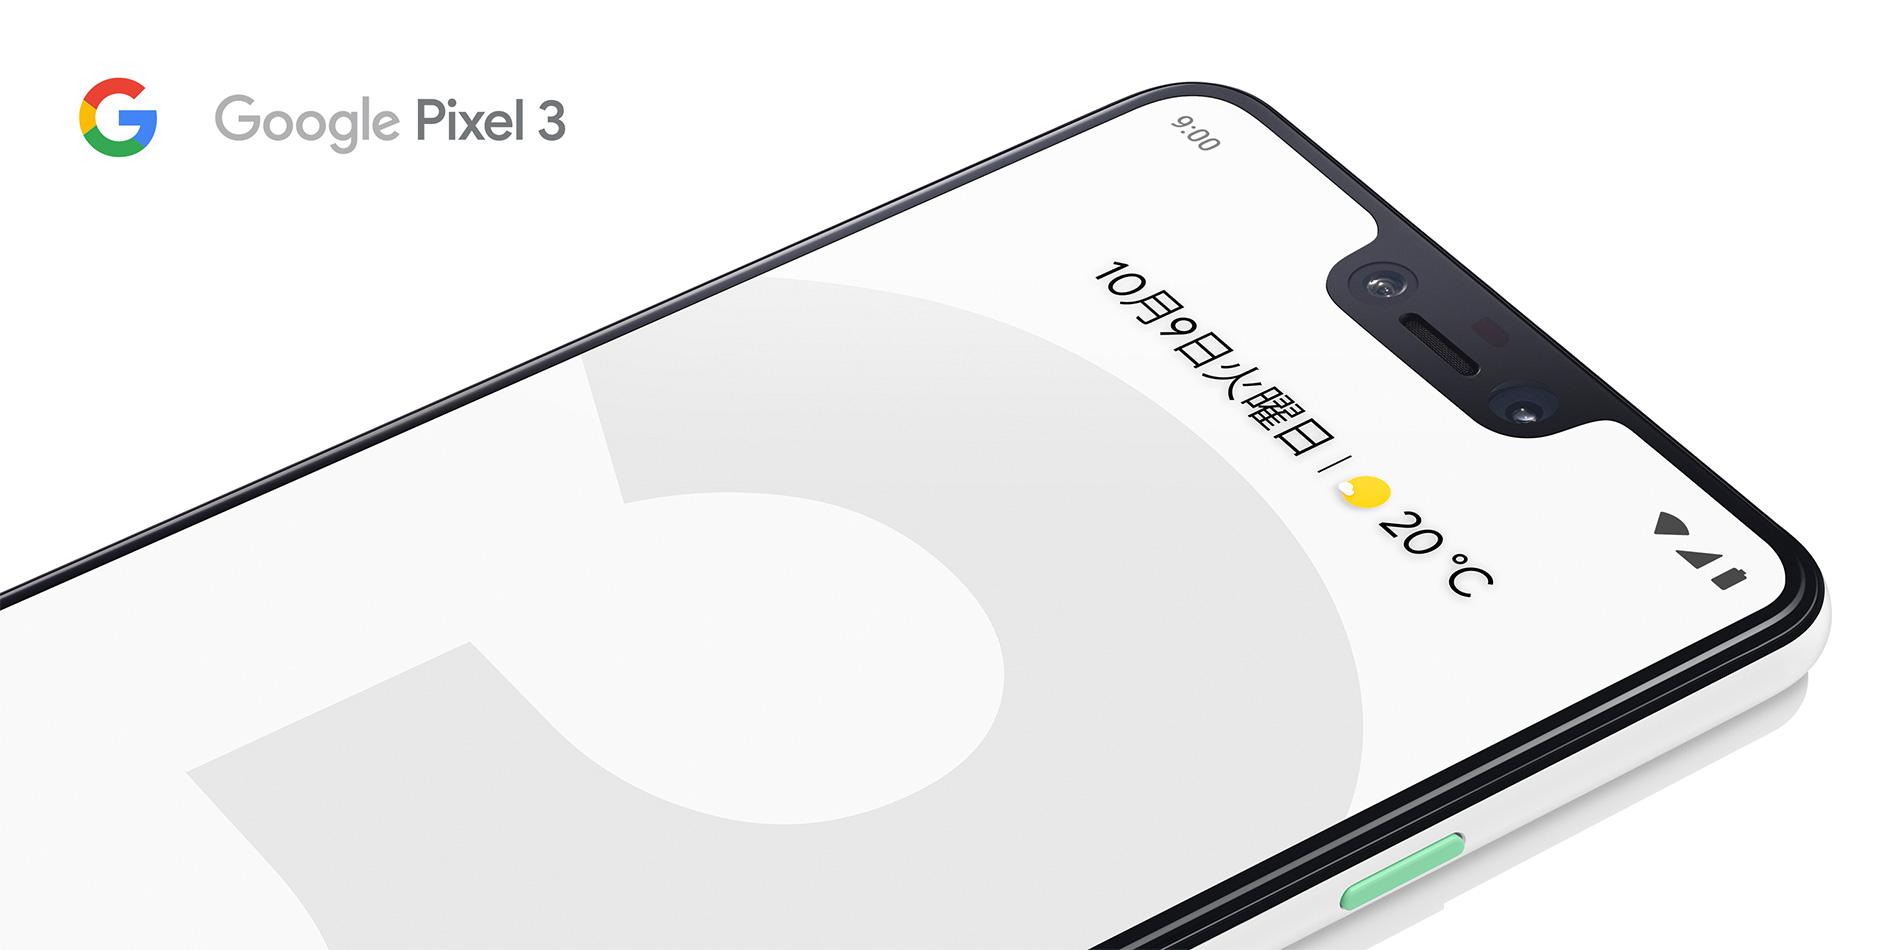 Googleがつくった新型スマホ「Pixel 3」「Pixel 3 XL」が発売!AIをフル活用